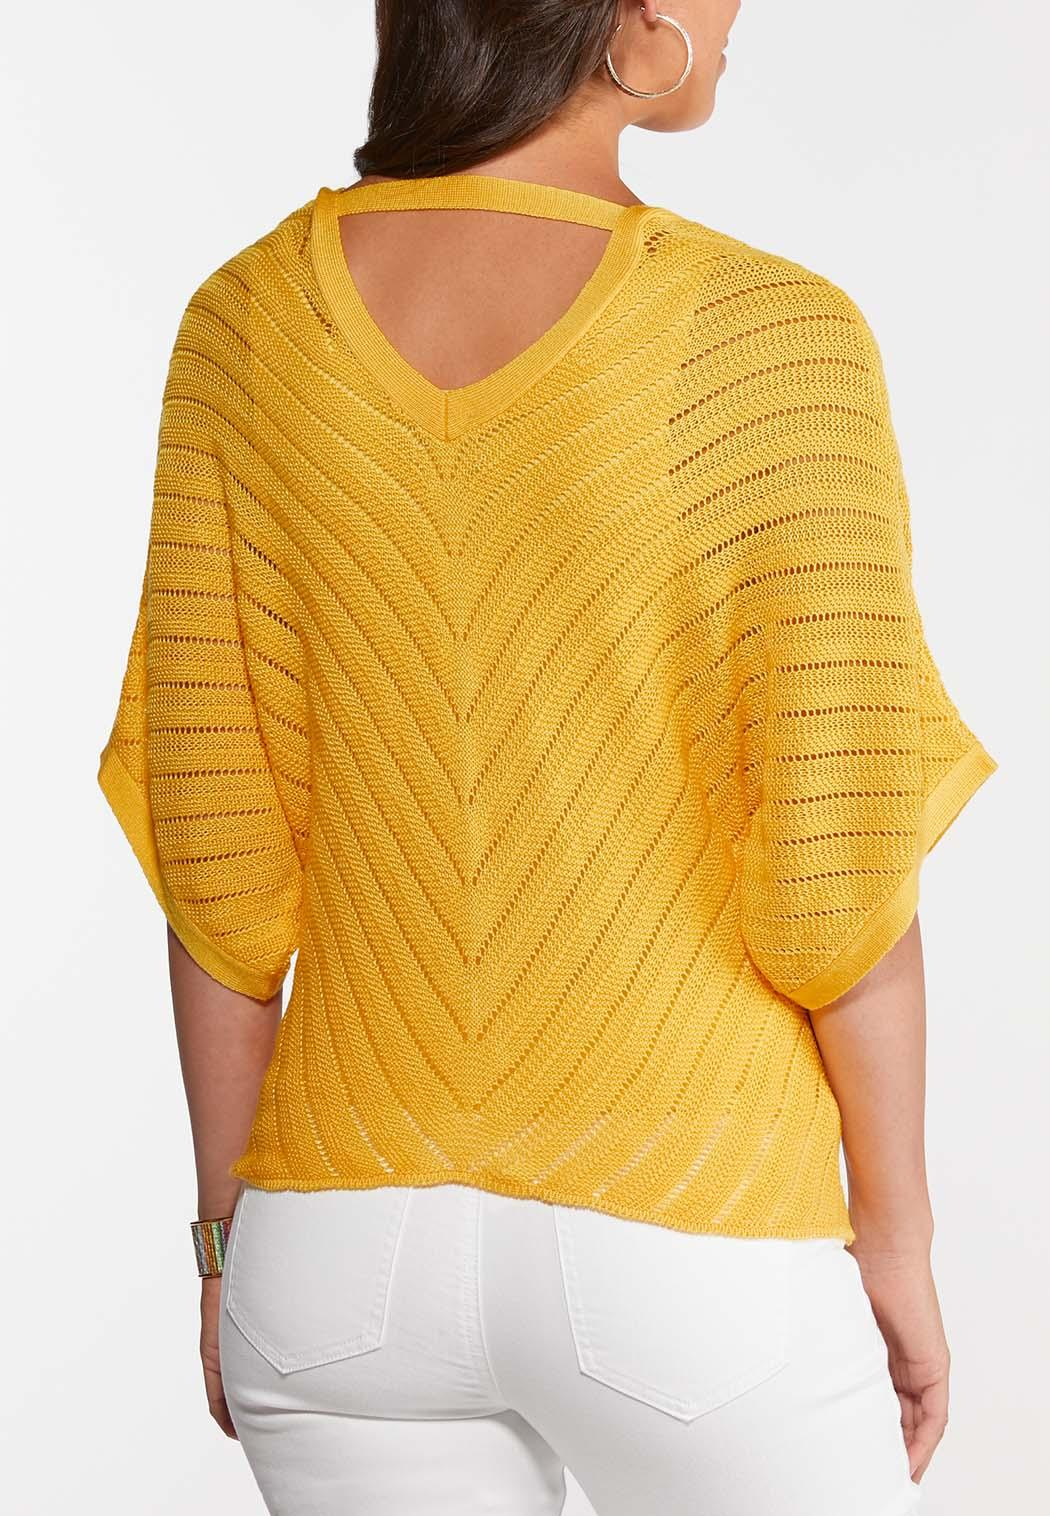 Plus Size Summer Sweater Top (Item #44270327)